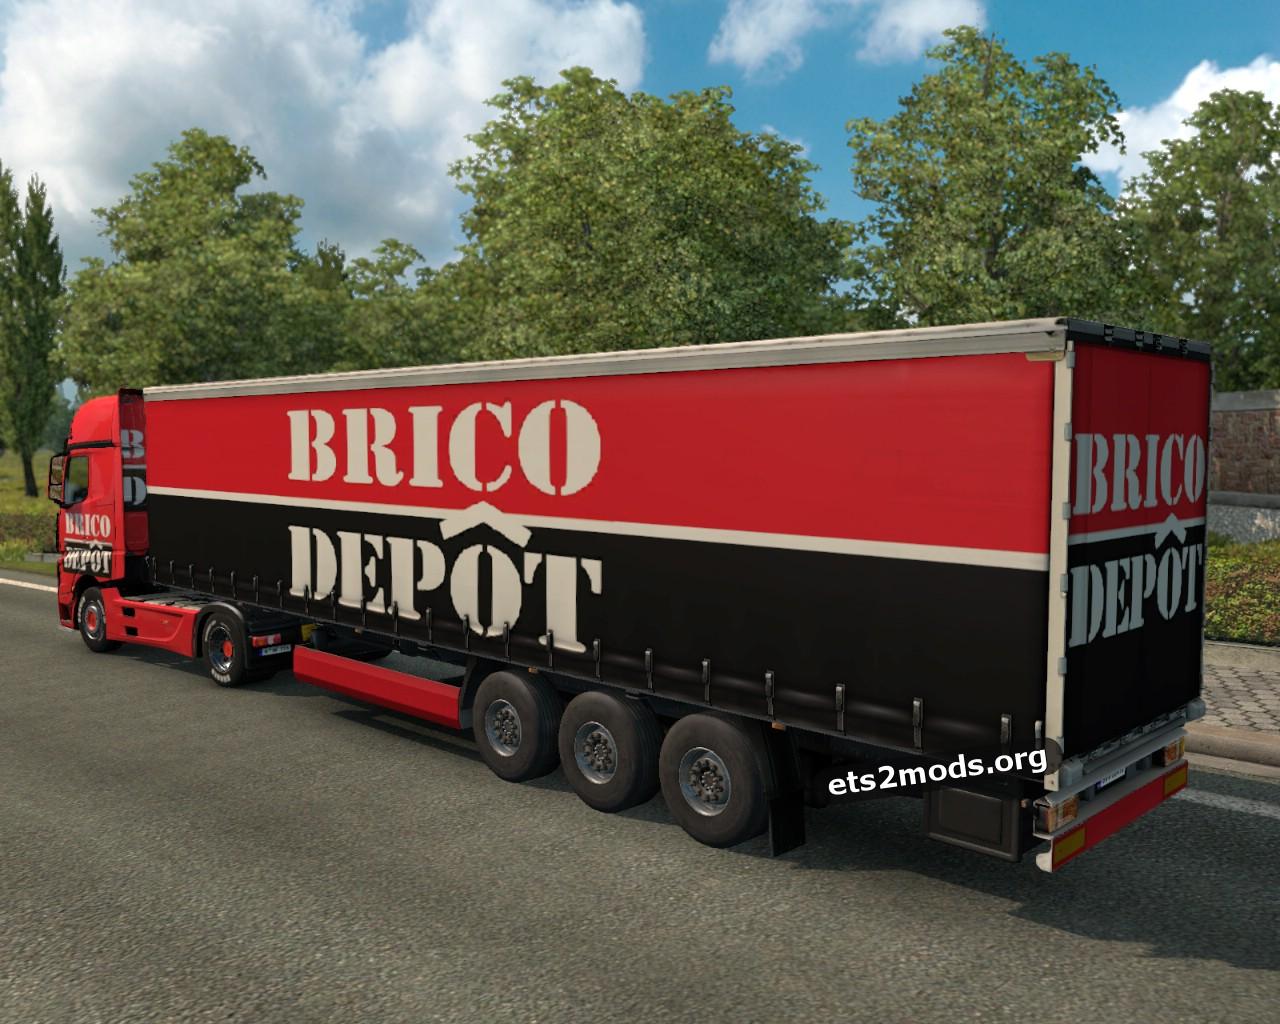 bricodpot laval vente privee brico depot e d angle e s e vente privee brico depot laval with. Black Bedroom Furniture Sets. Home Design Ideas